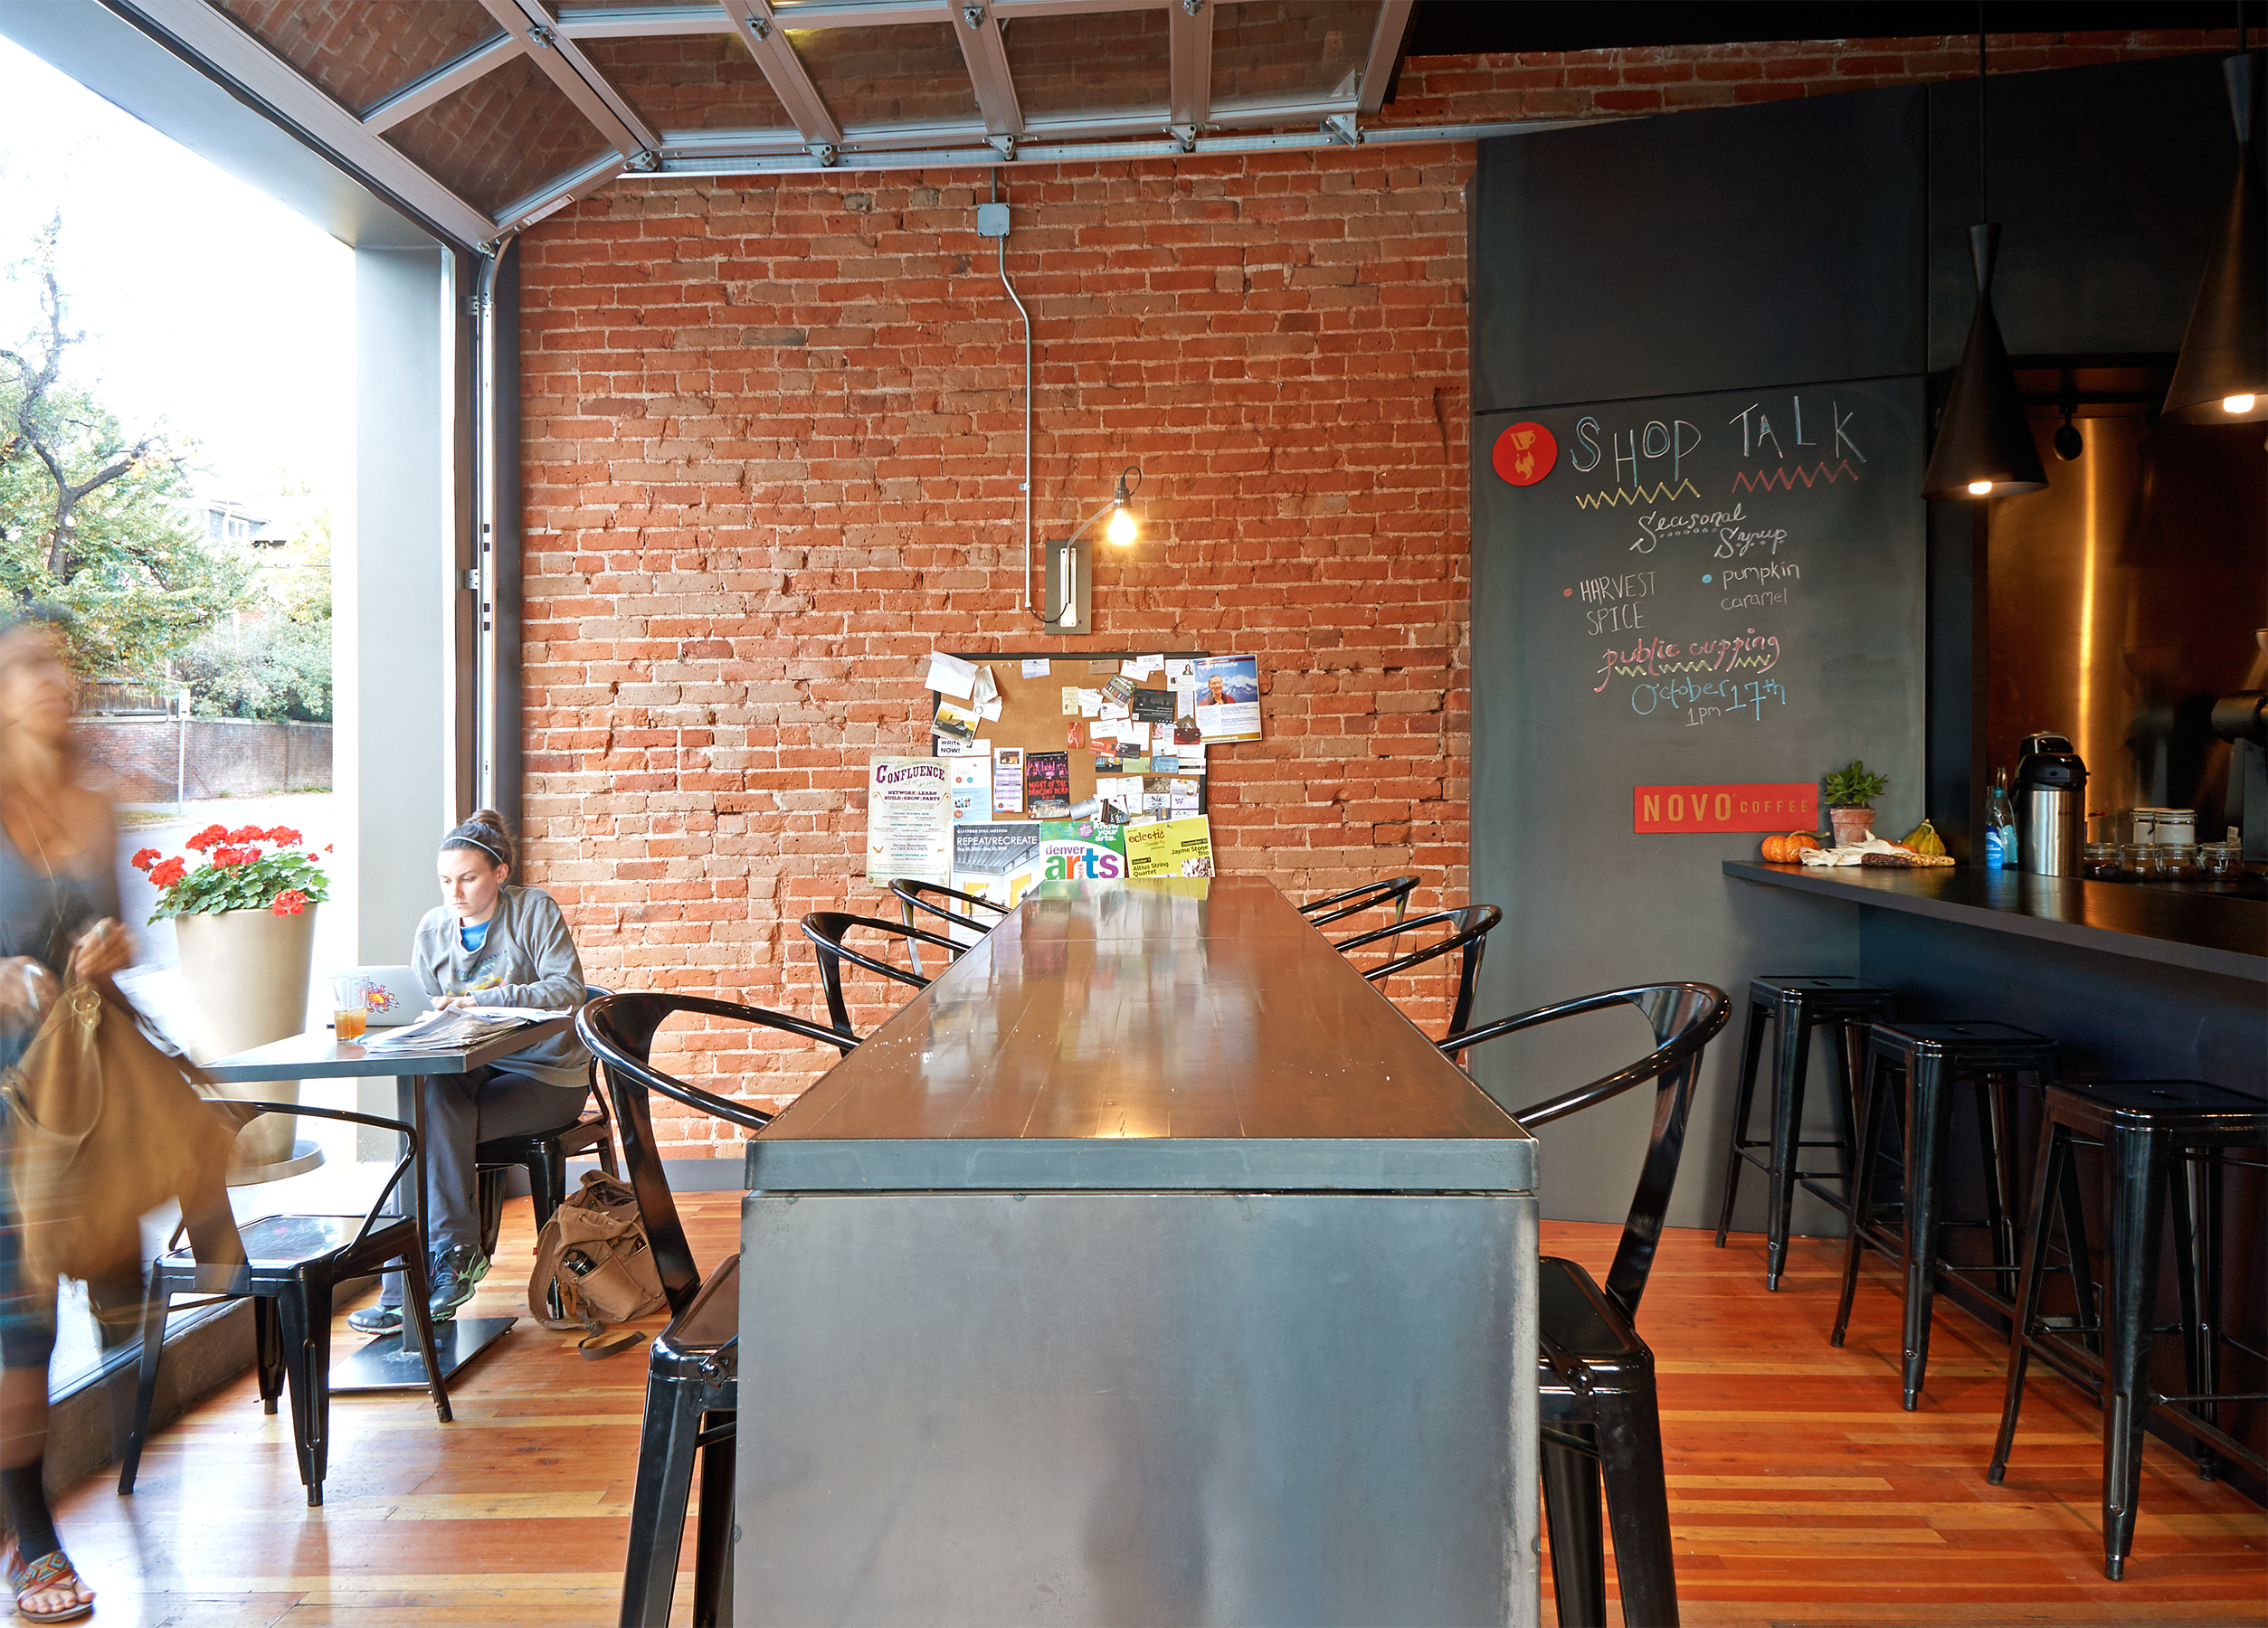 Novo Coffee Shop 6th & Gilpin Garage door community table open studio architecture OSA